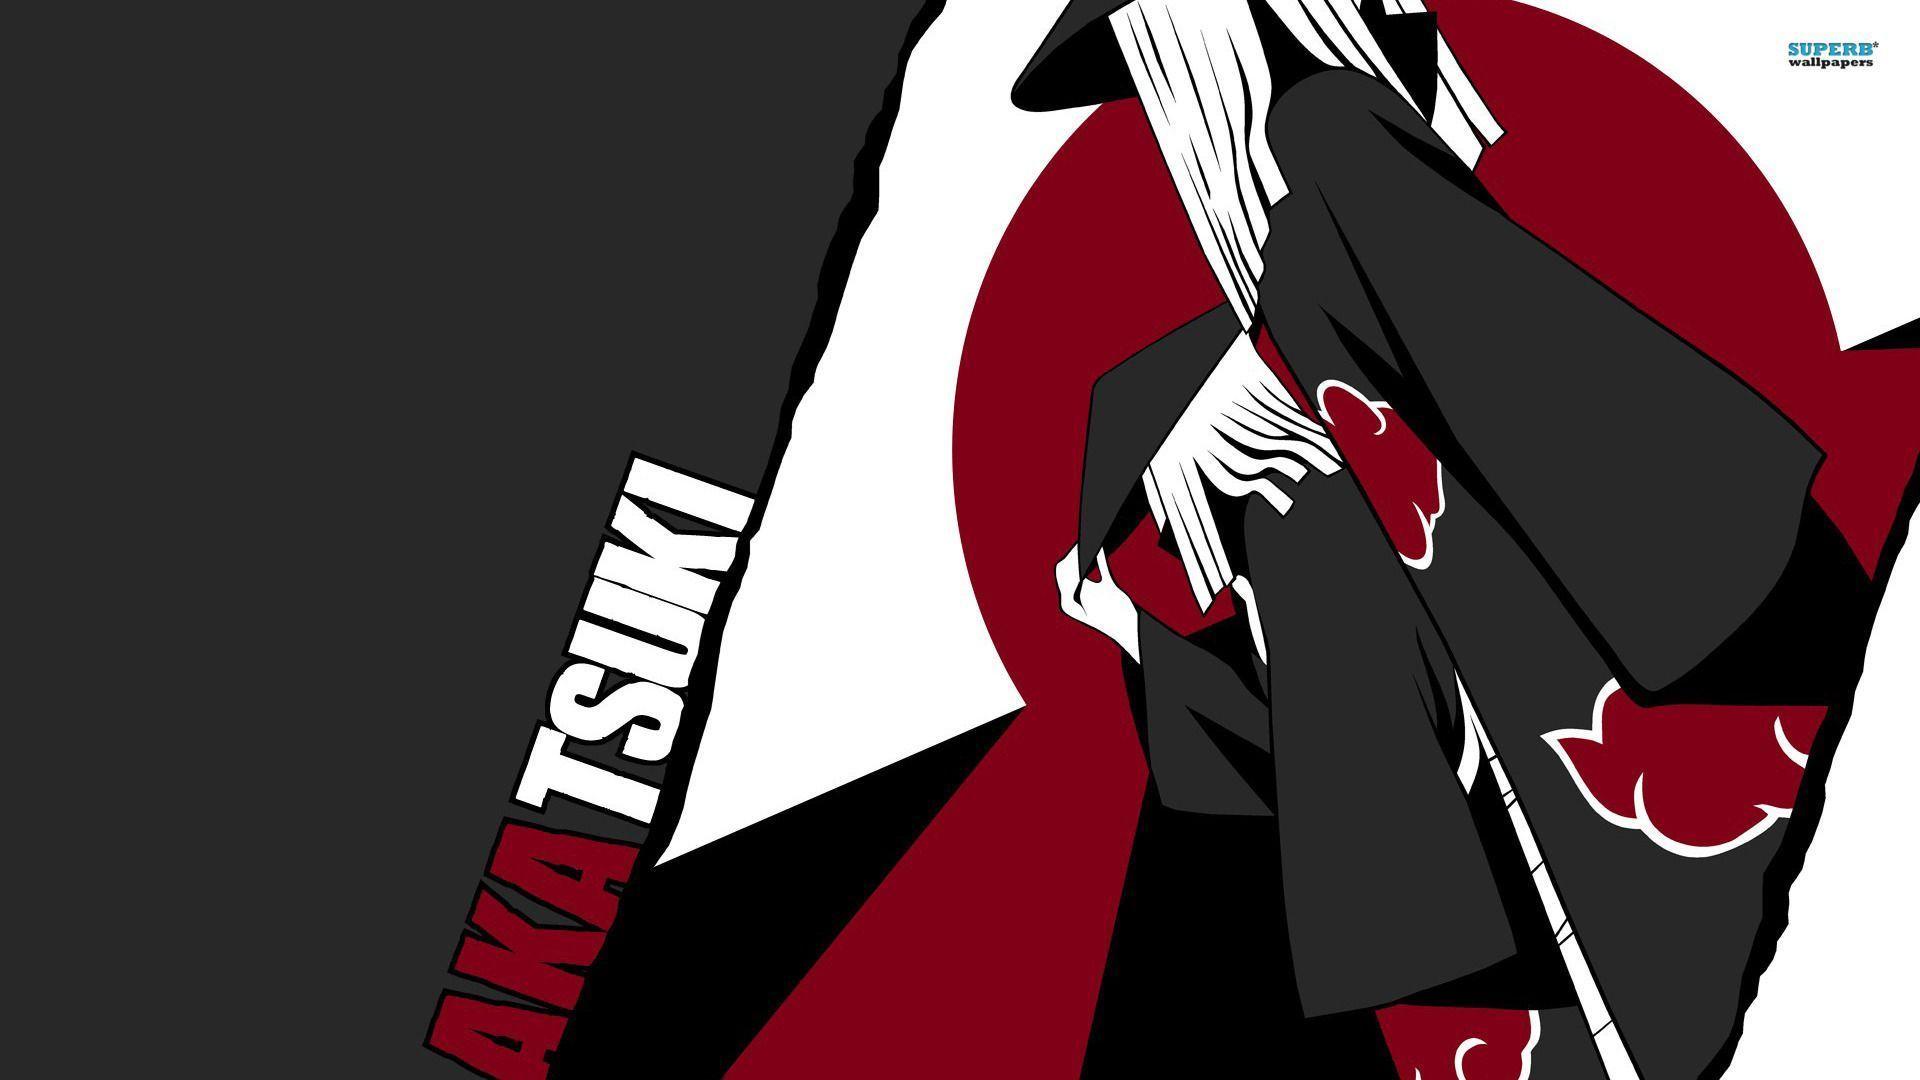 Akatsuki - Naruto wallpaper - Anime wallpapers - #13741